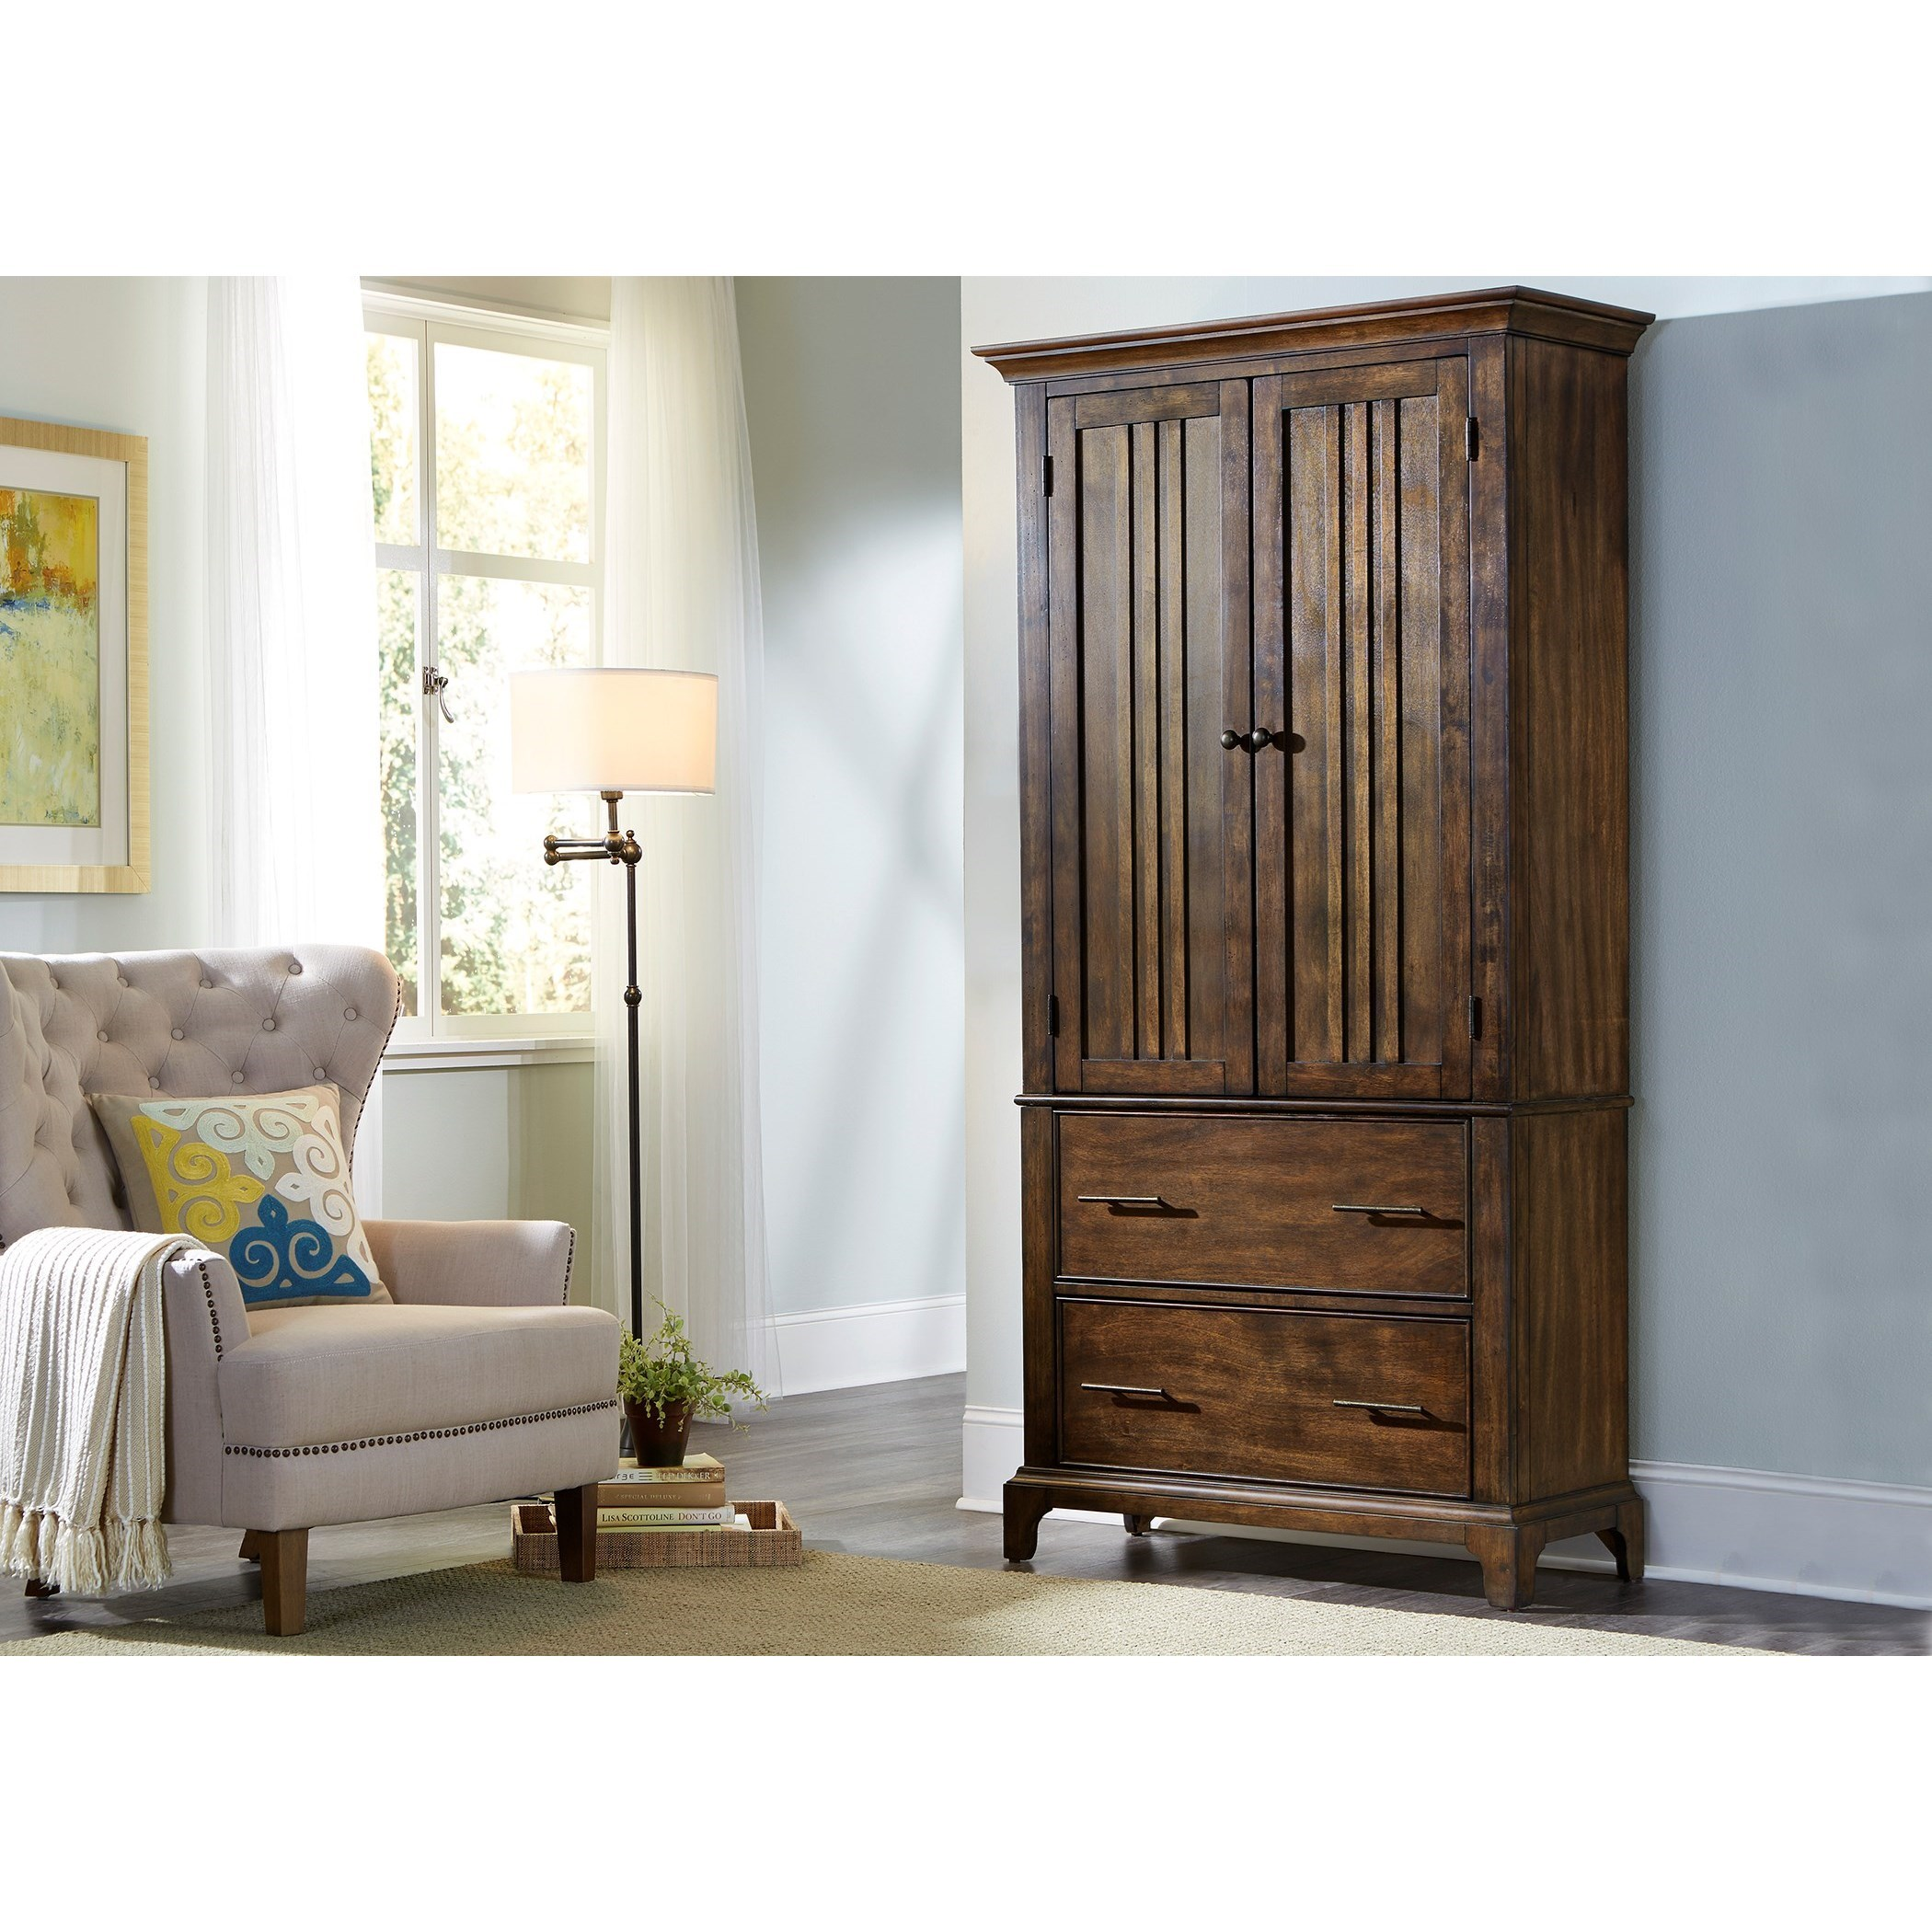 chest n dresser furniture liberty queen pin bed s mirror grandpa sleigh cabin